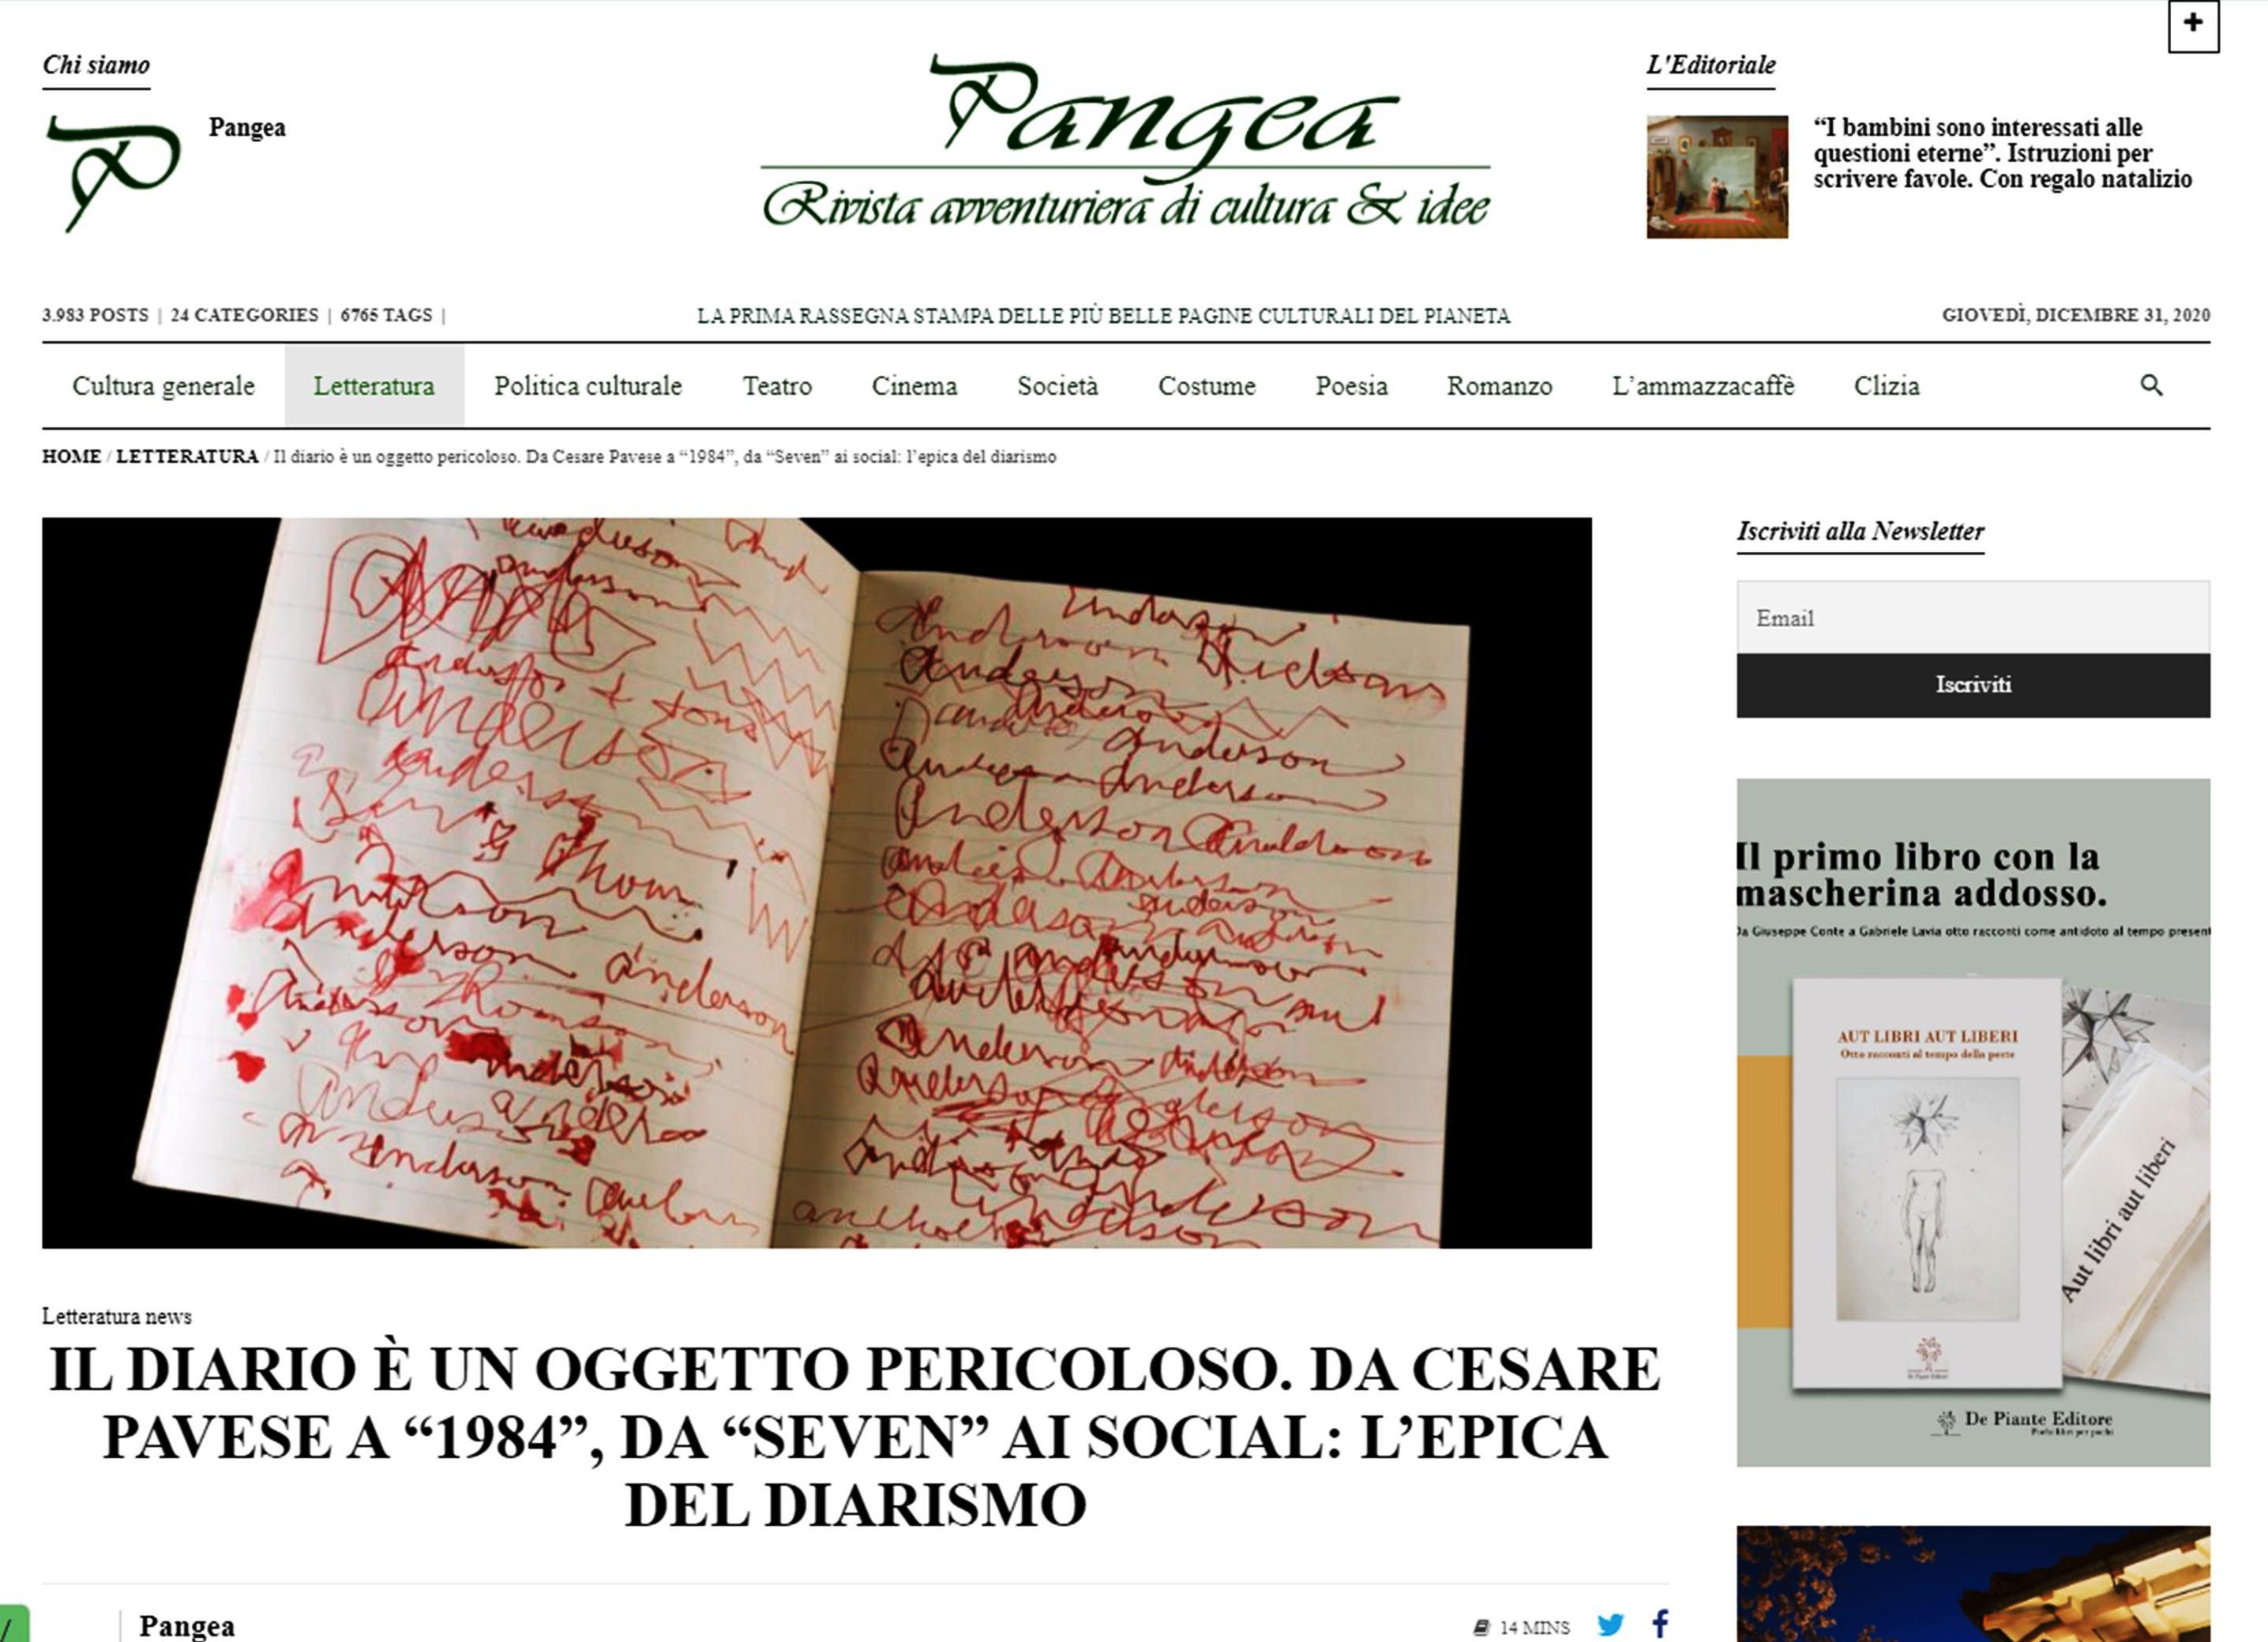 diarismi pangea